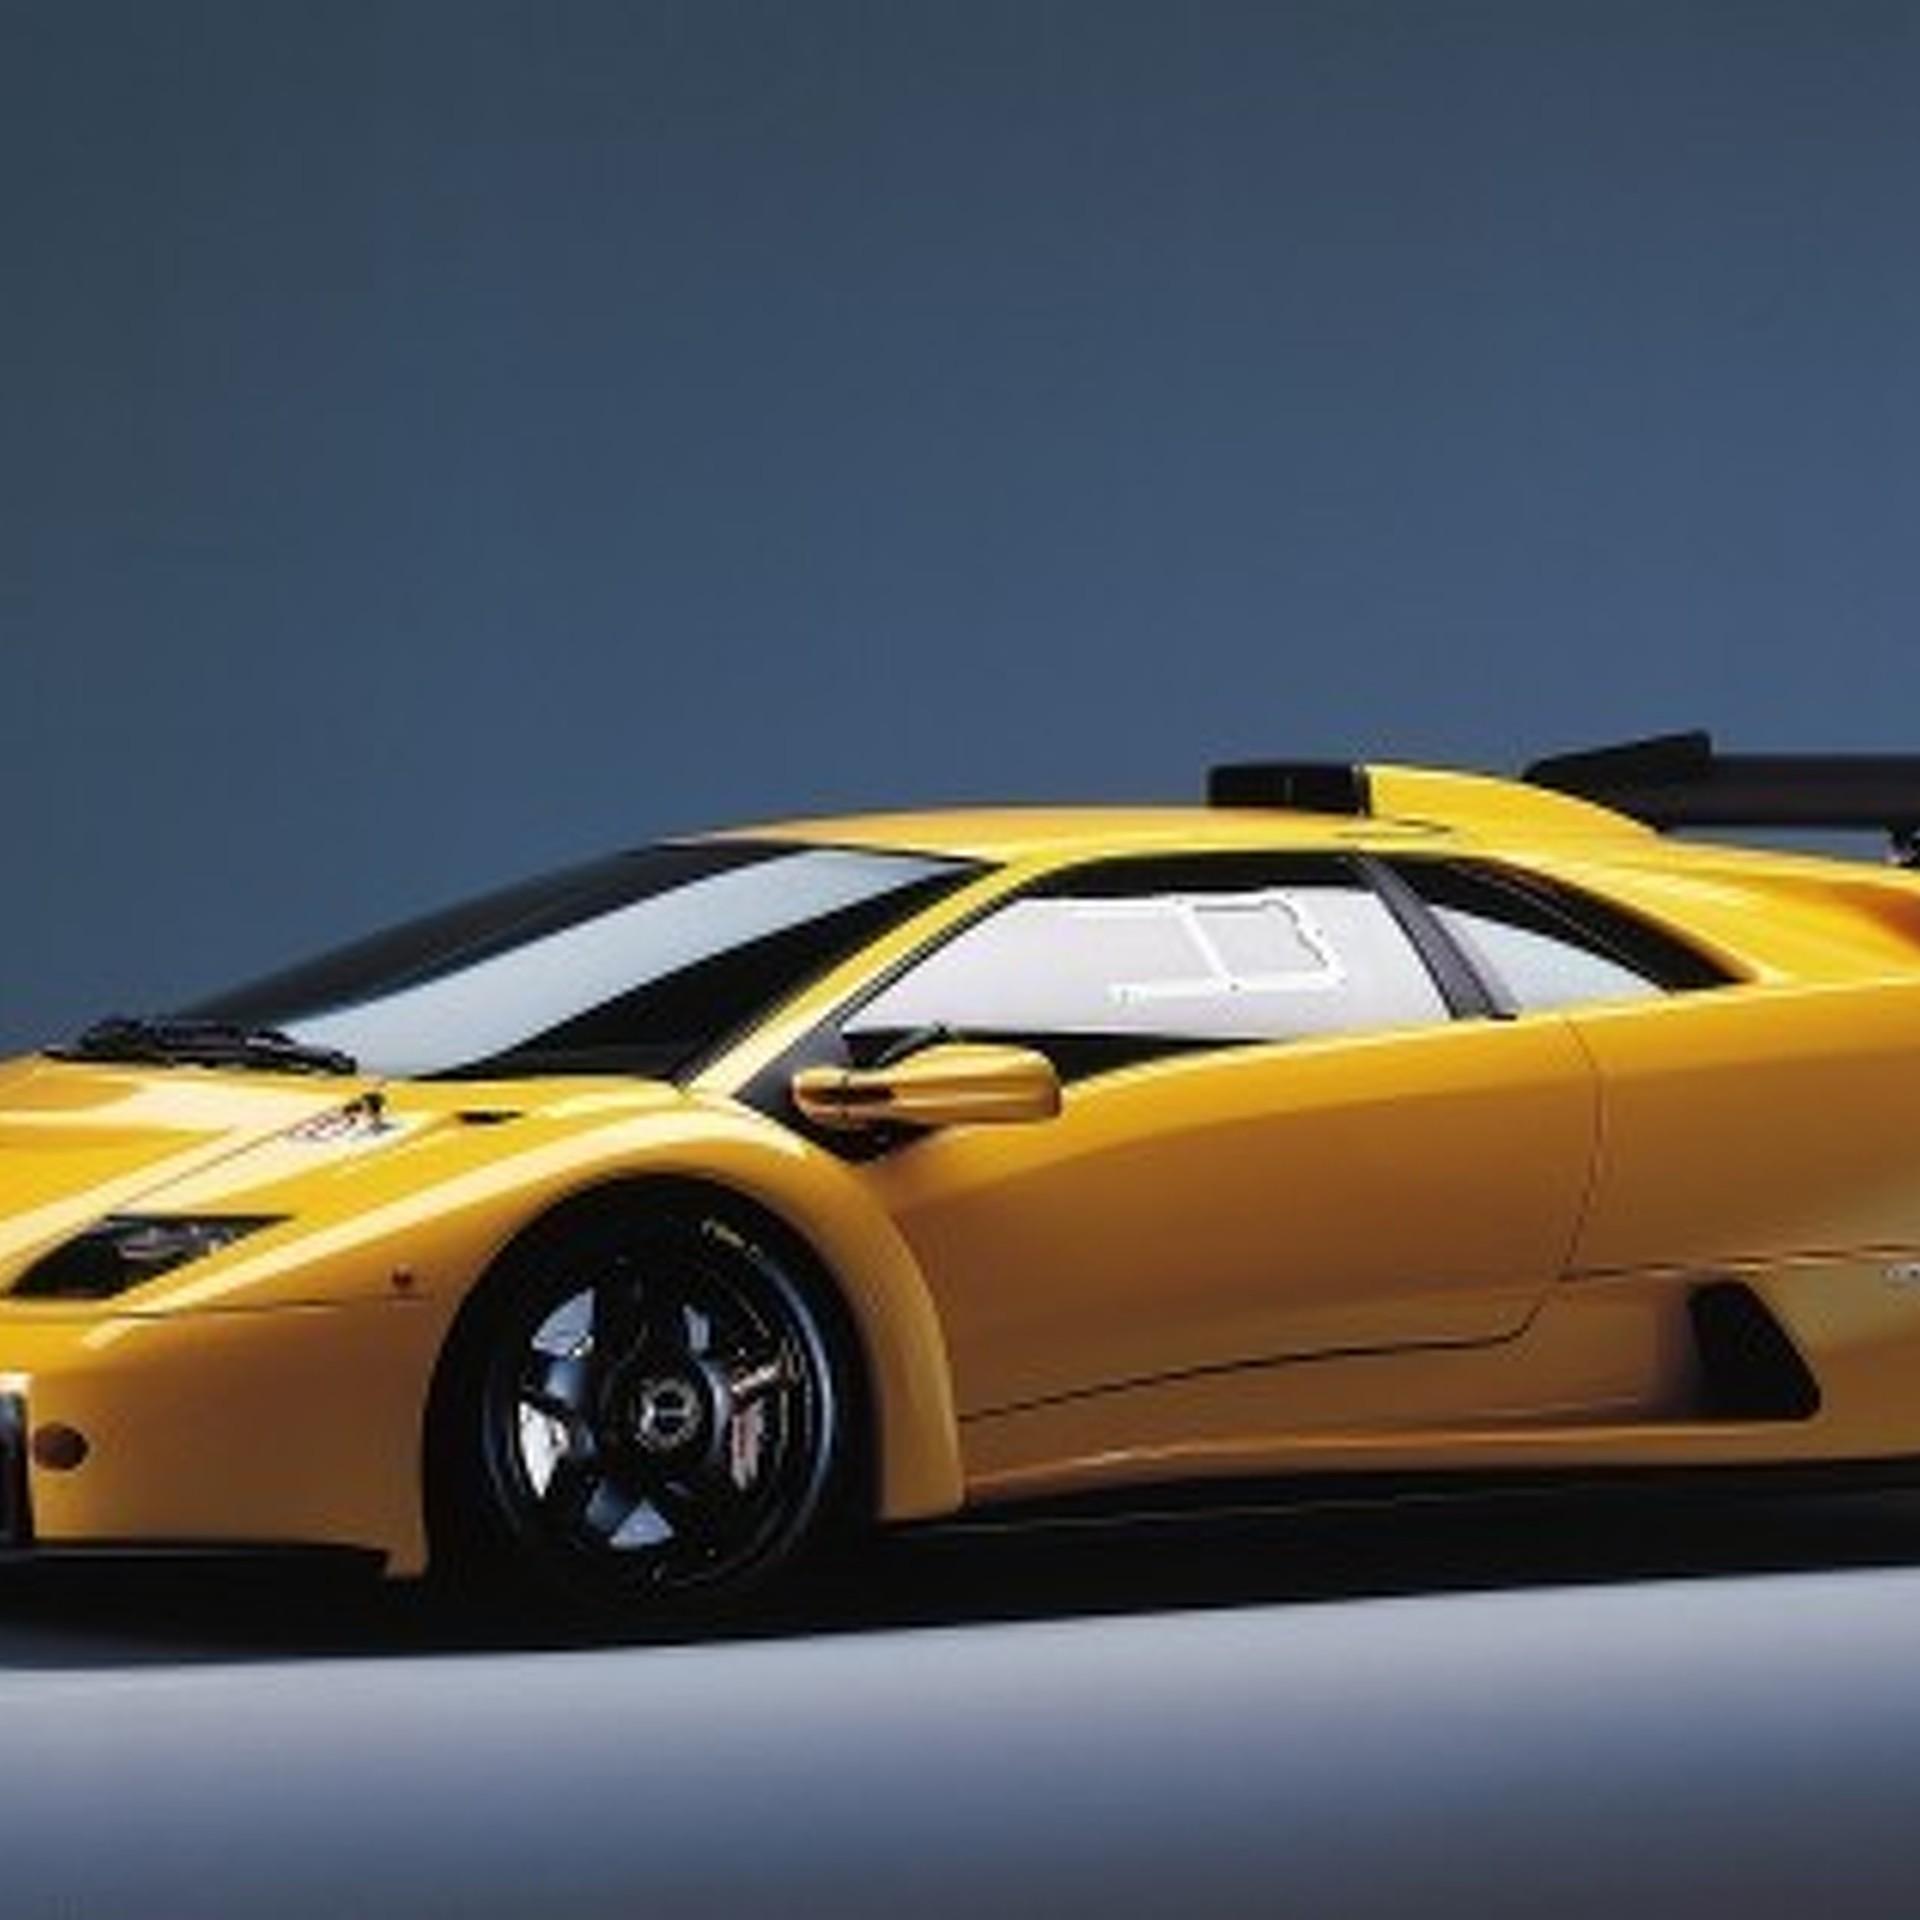 Lamborghini Walpaper: 20 Best Lamborghini Wallpapers